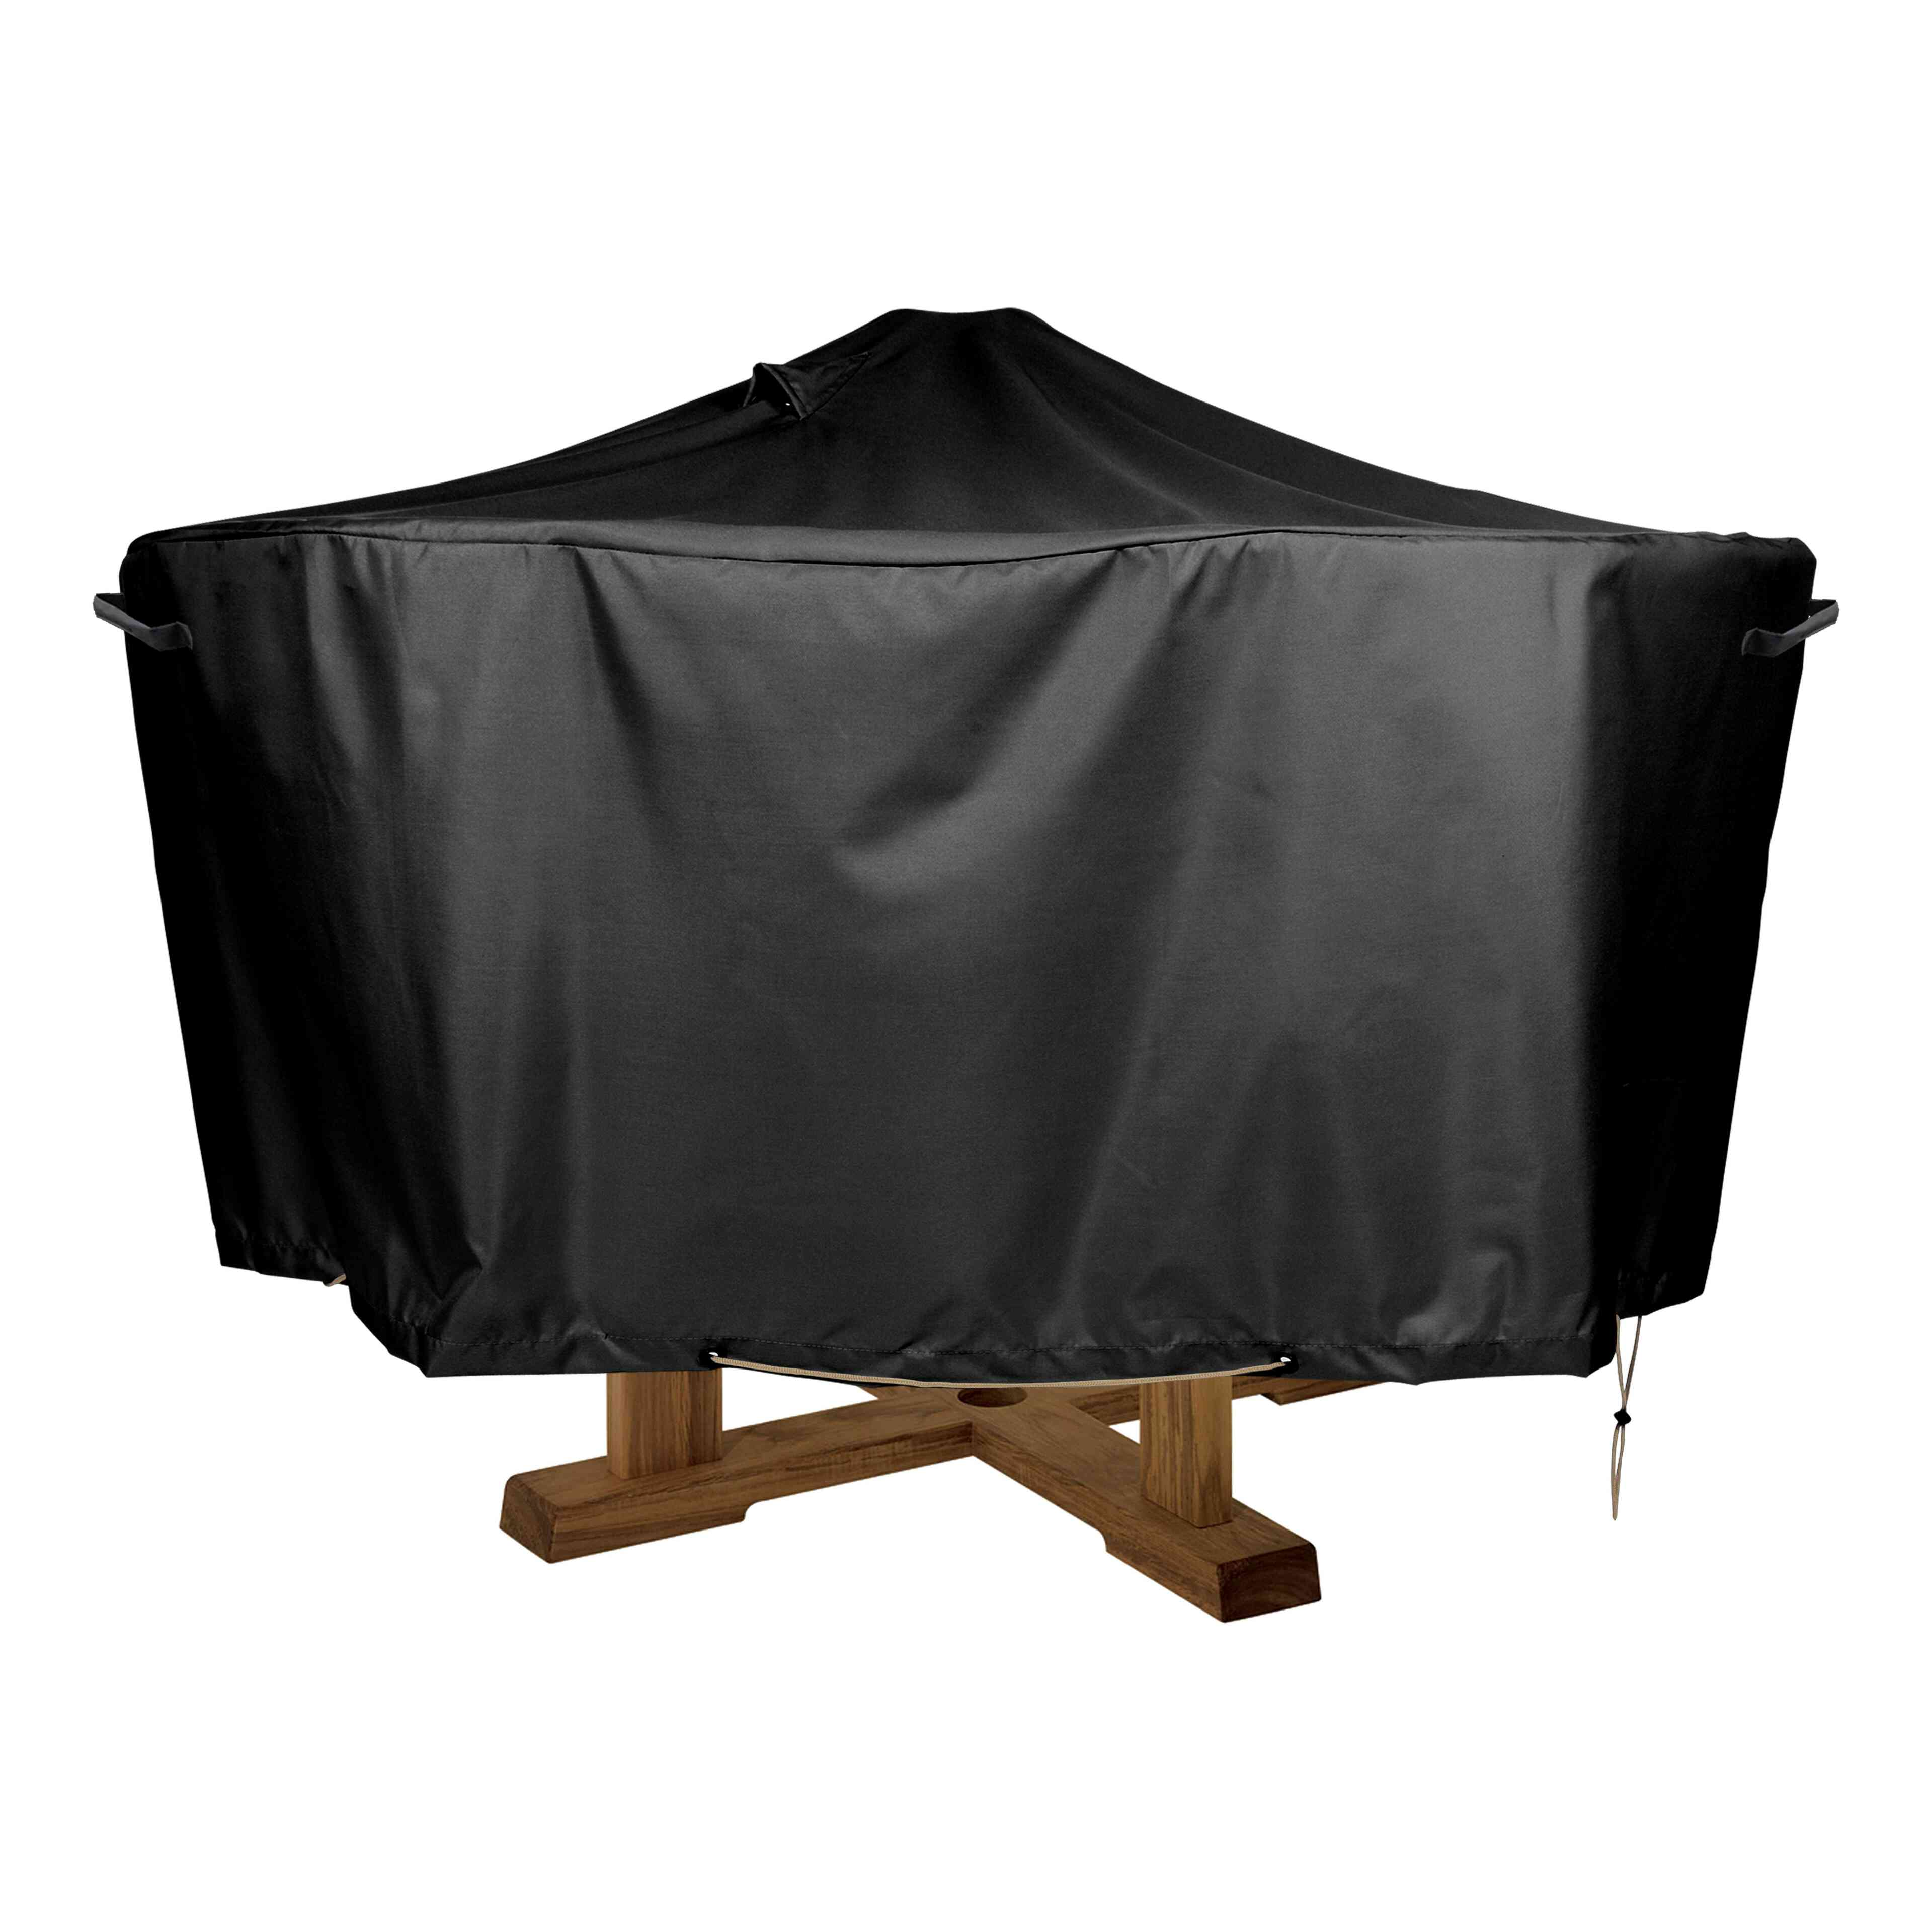 housse de protection table ronde d 39 ext rieur oviala. Black Bedroom Furniture Sets. Home Design Ideas